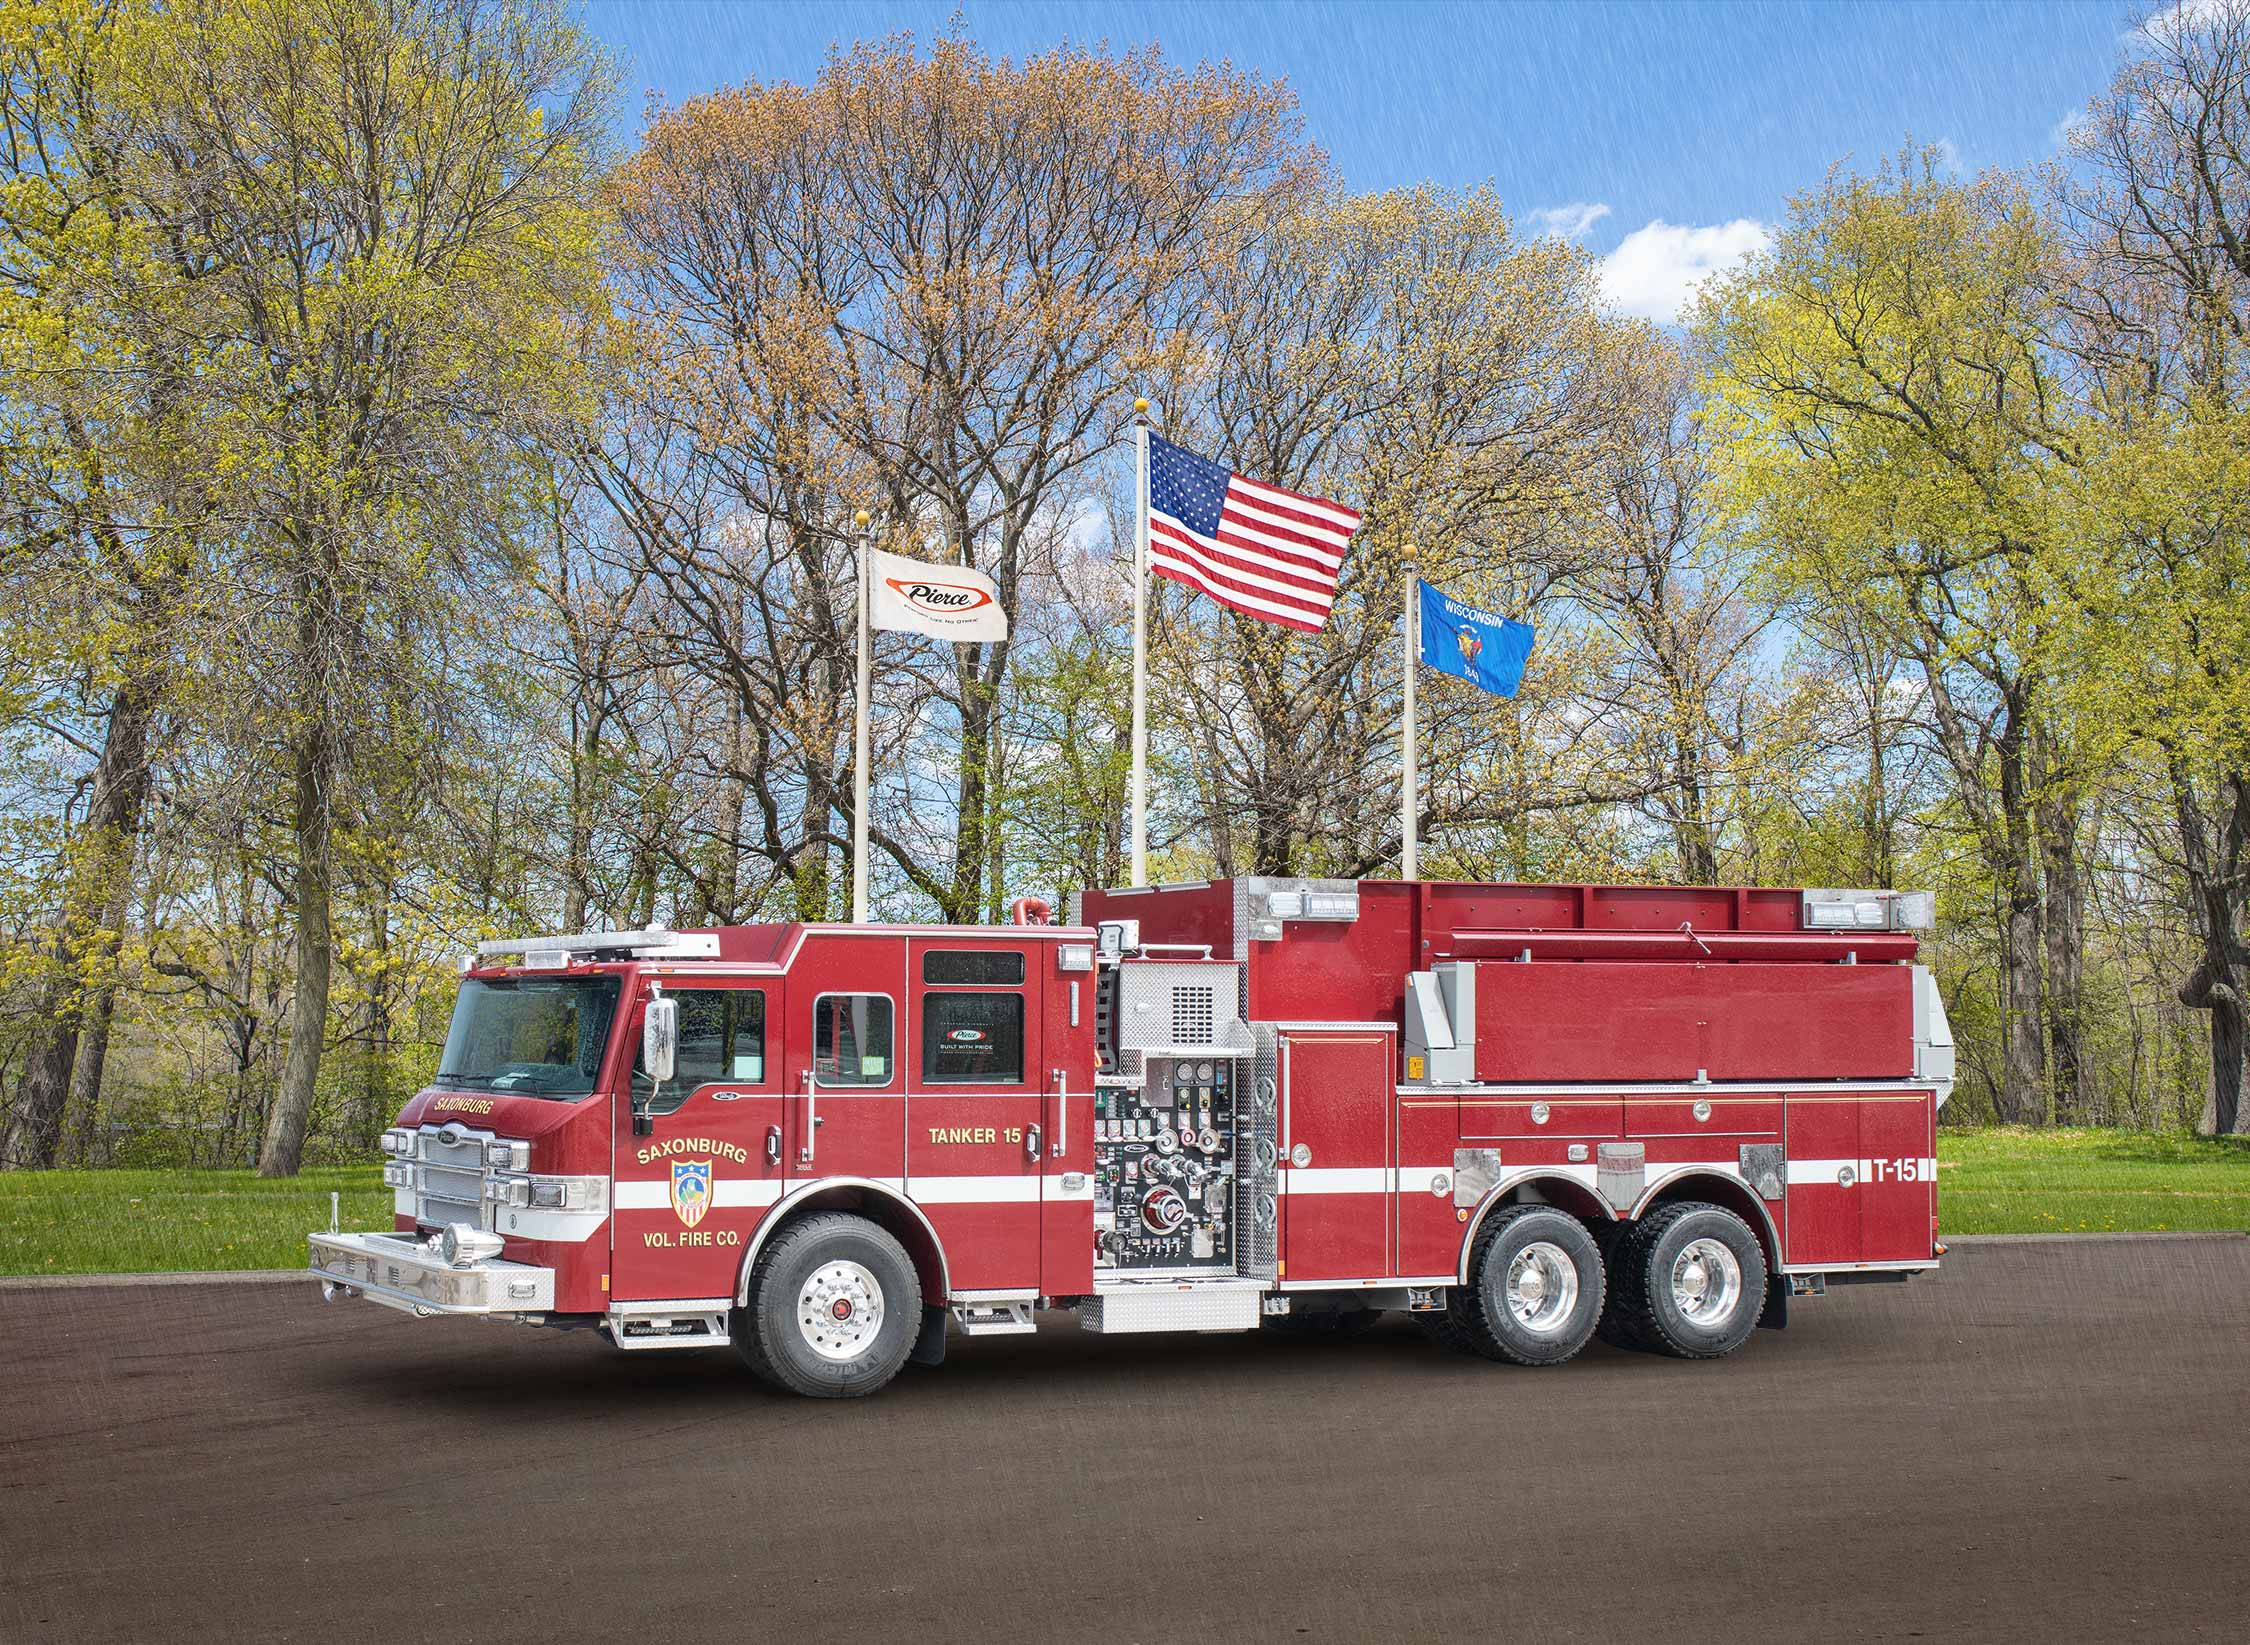 Saxonburg Volunteer Fire Company - Tanker